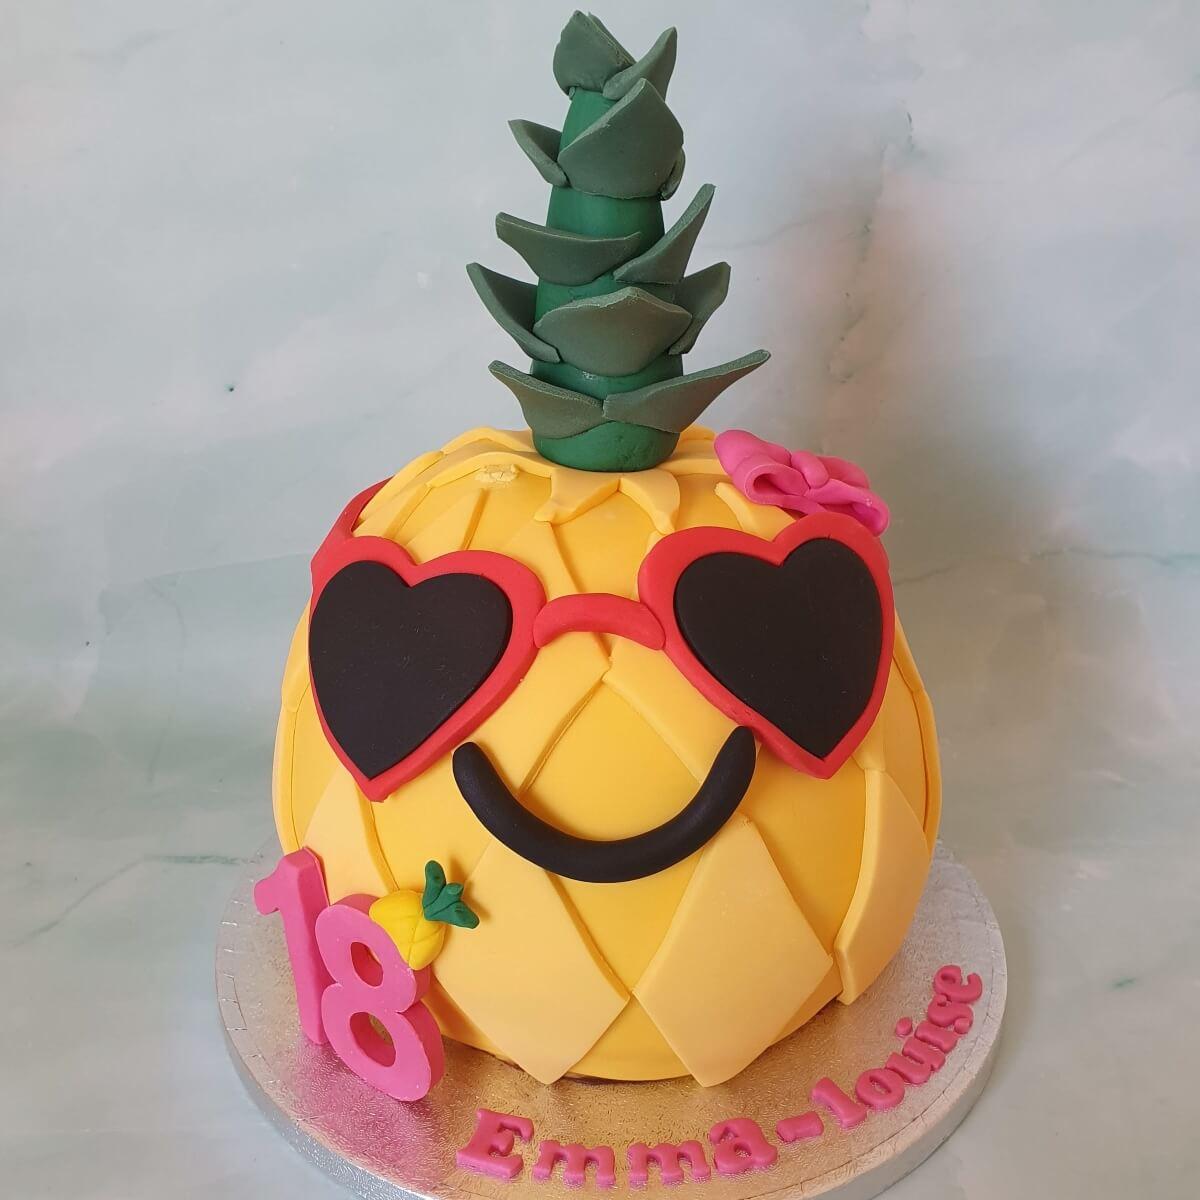 Pineapple 3D Shaped Birthday Cake Delivered Milton Keynes Cake Maker